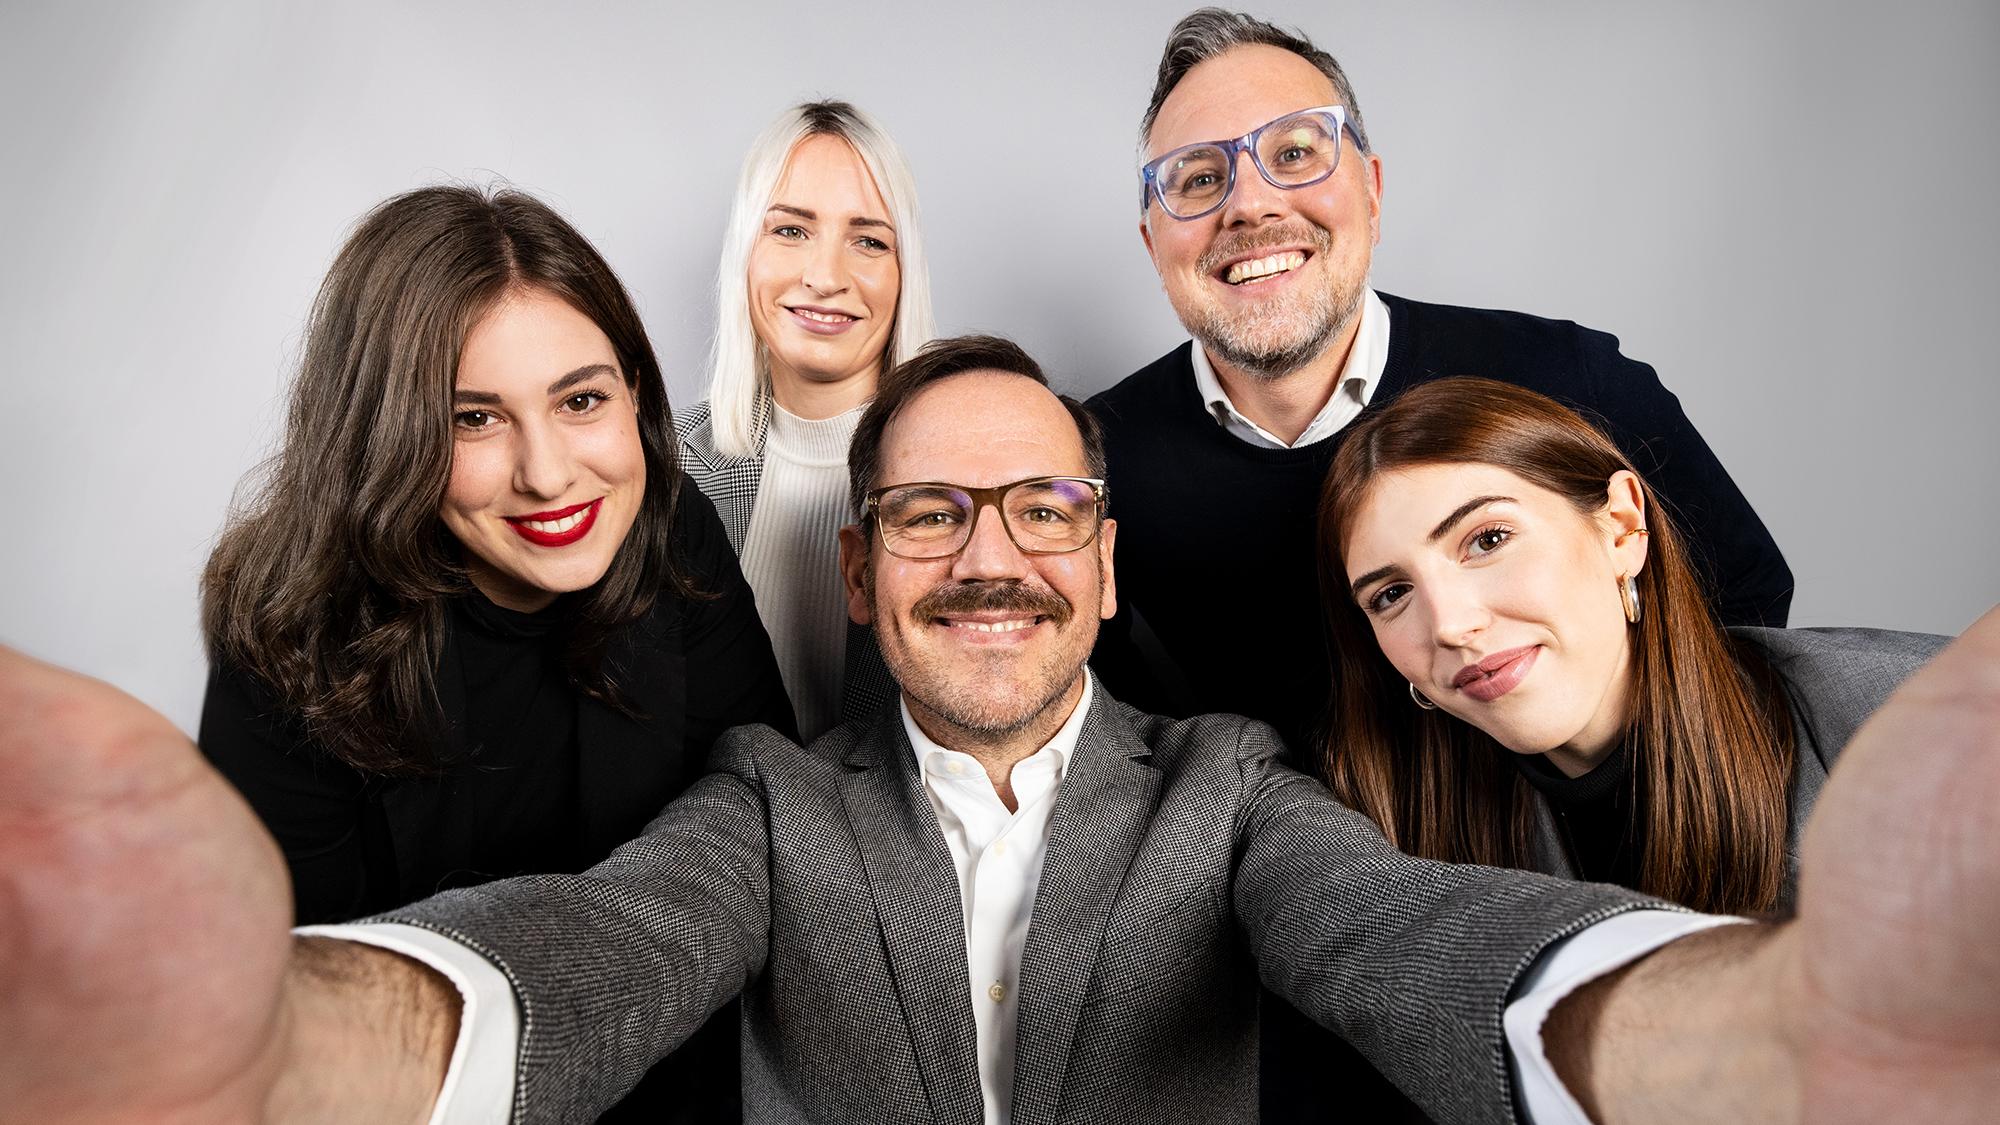 Das beste Eis Media-Agentur Team Frankfurt